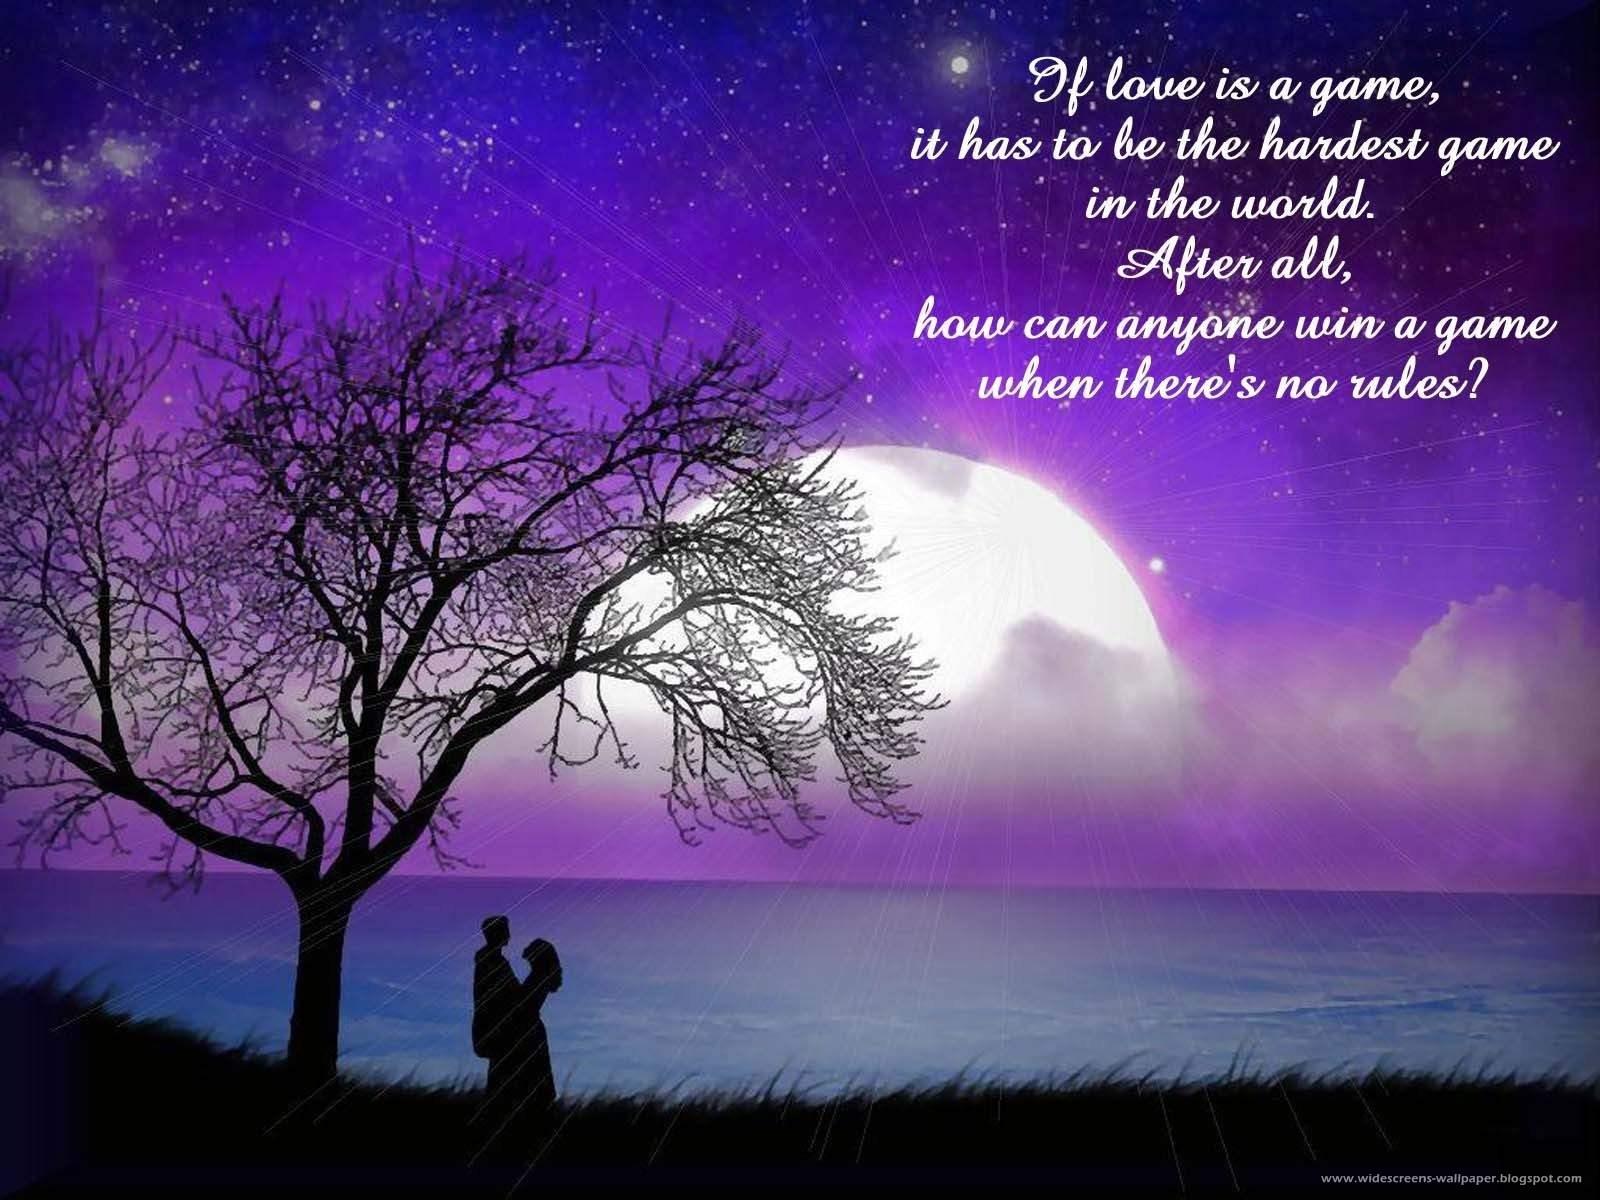 Best Wallpaper Night Couple - Best-Short-Love-Quote-wallpaper  HD.jpg